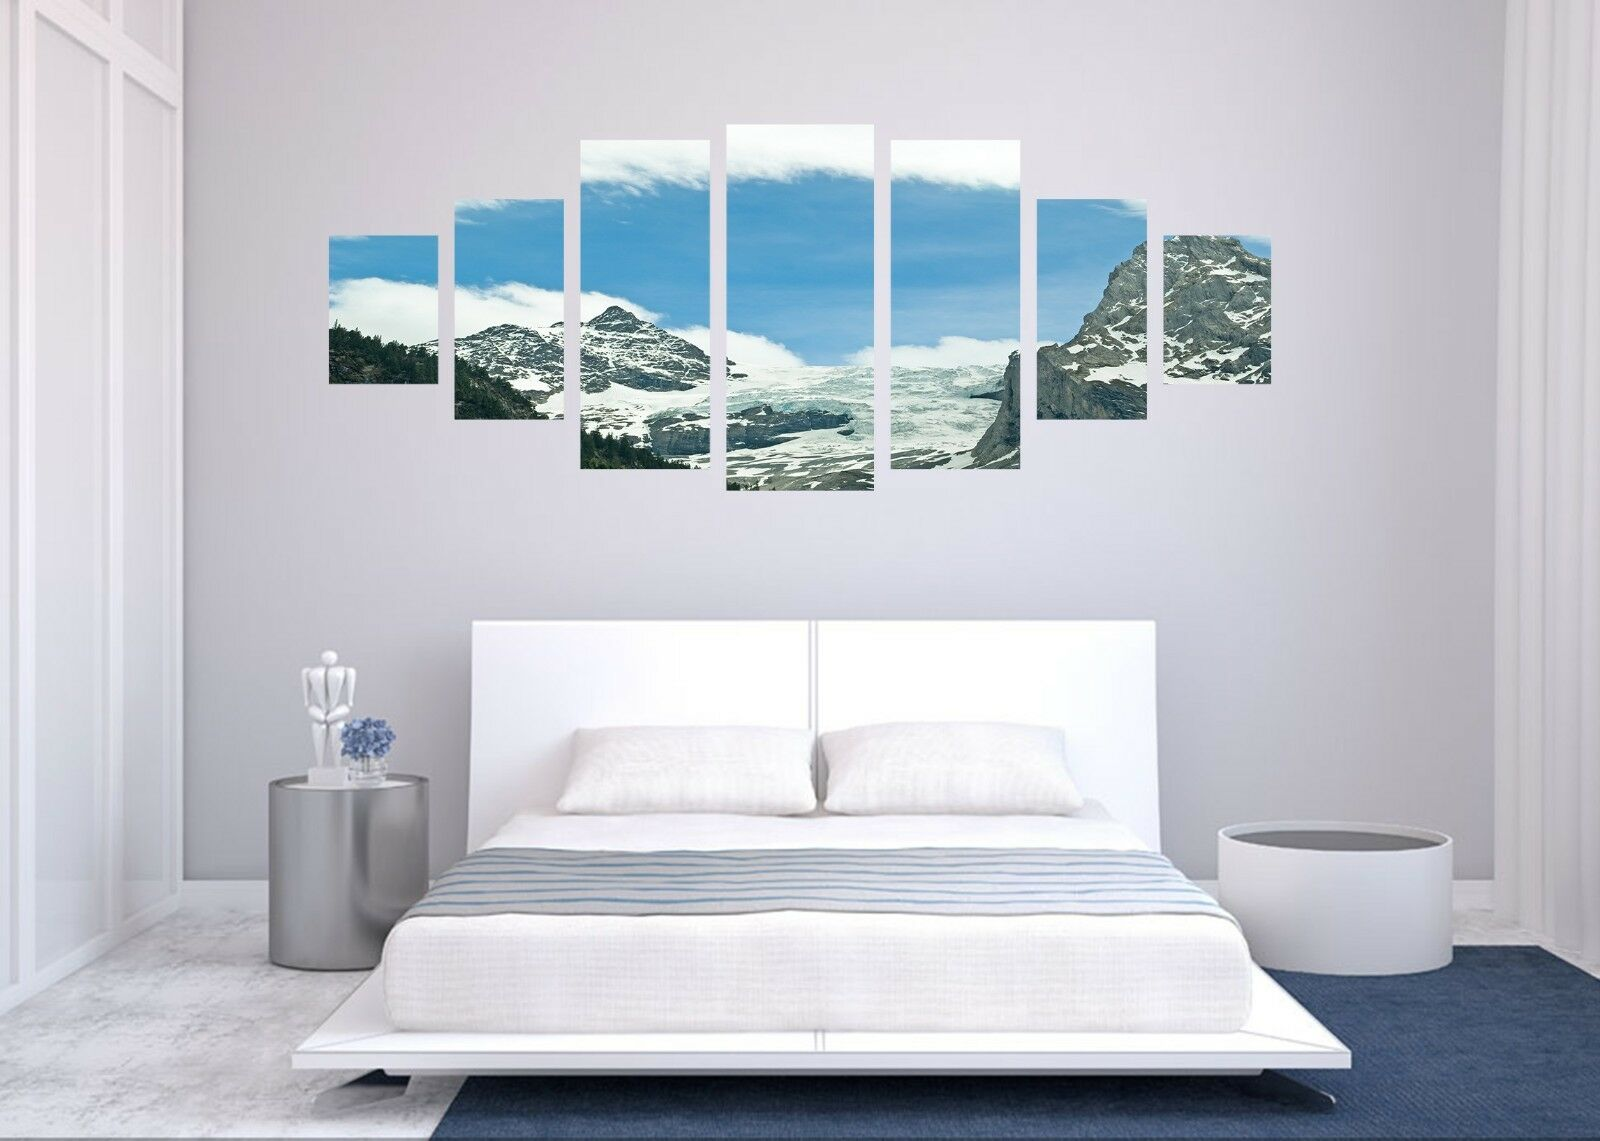 3D Mountain Peak 72 Unframed Print Wall Paper Decal Wall Deco Indoor AJ Jenny